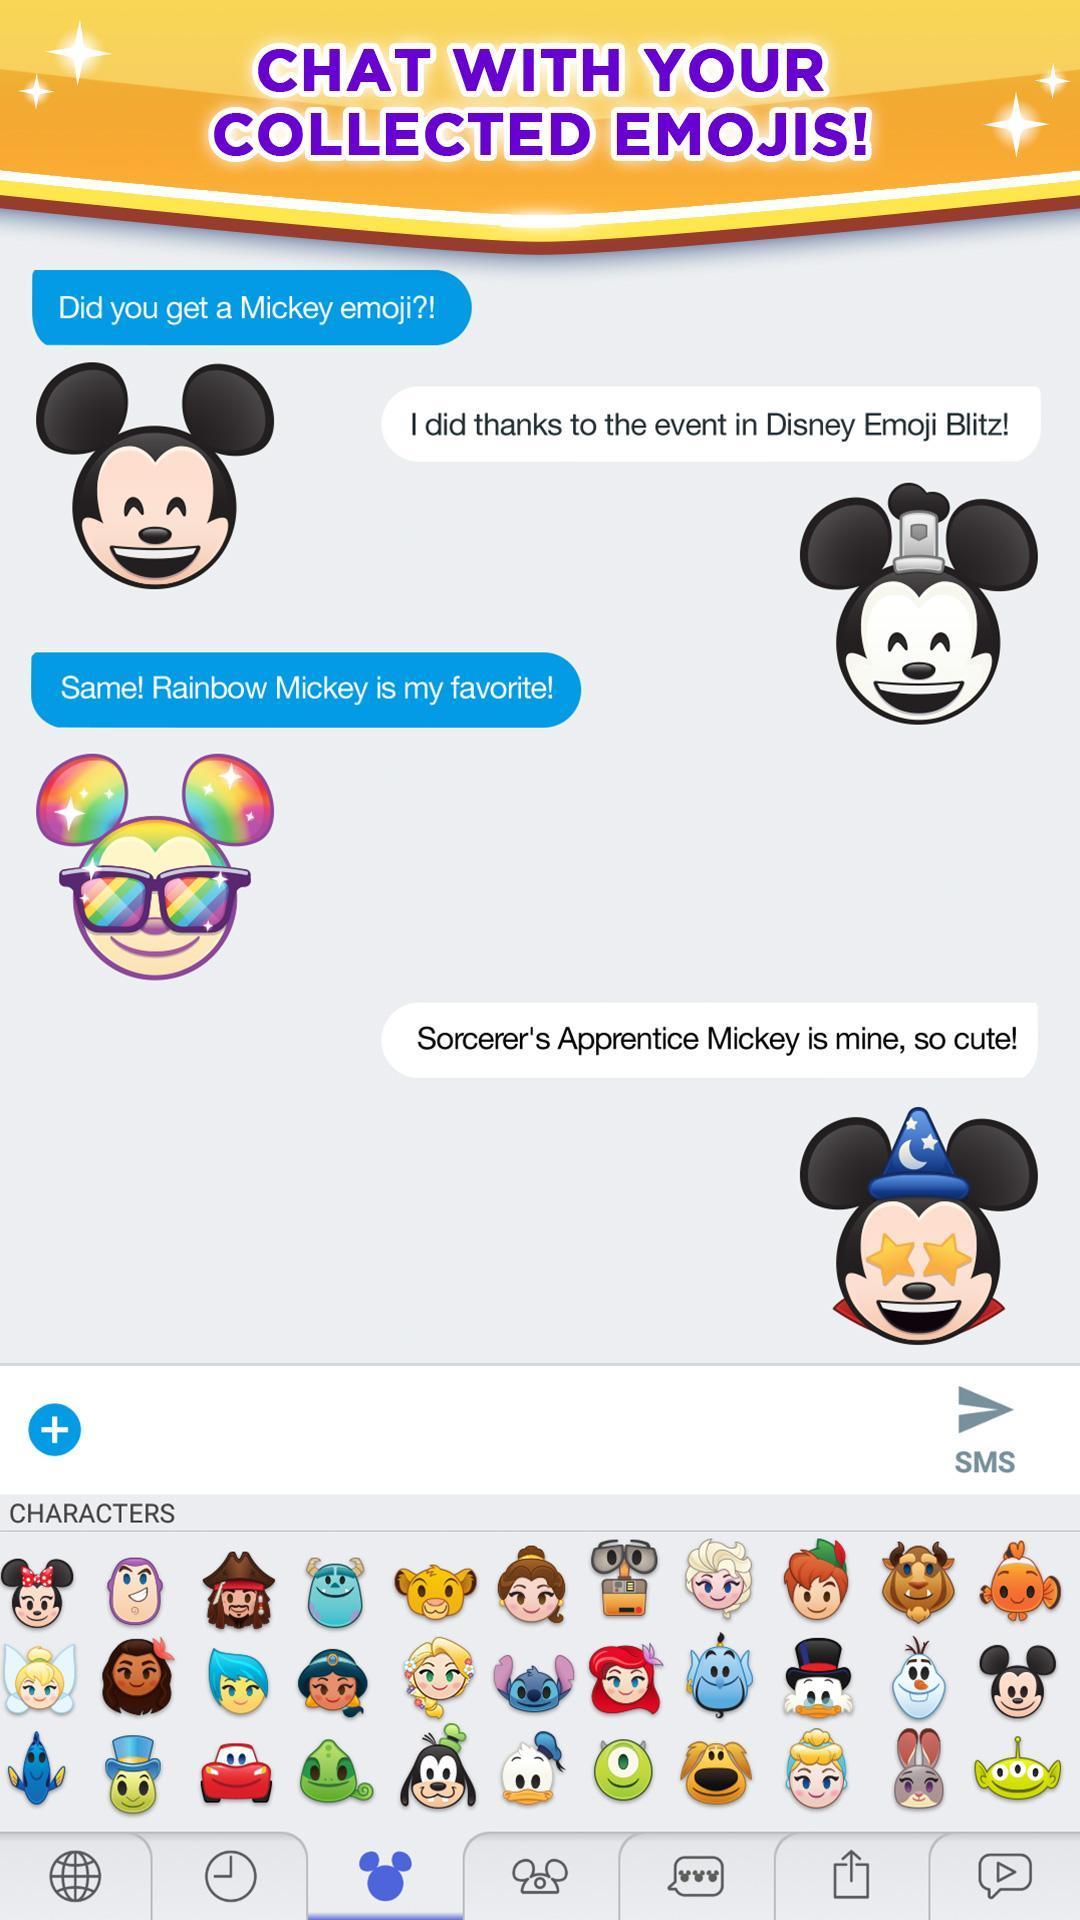 Disney Emoji Blitz For Android  Apk Download with Disney Emoji Blitz Event Calendar 2020